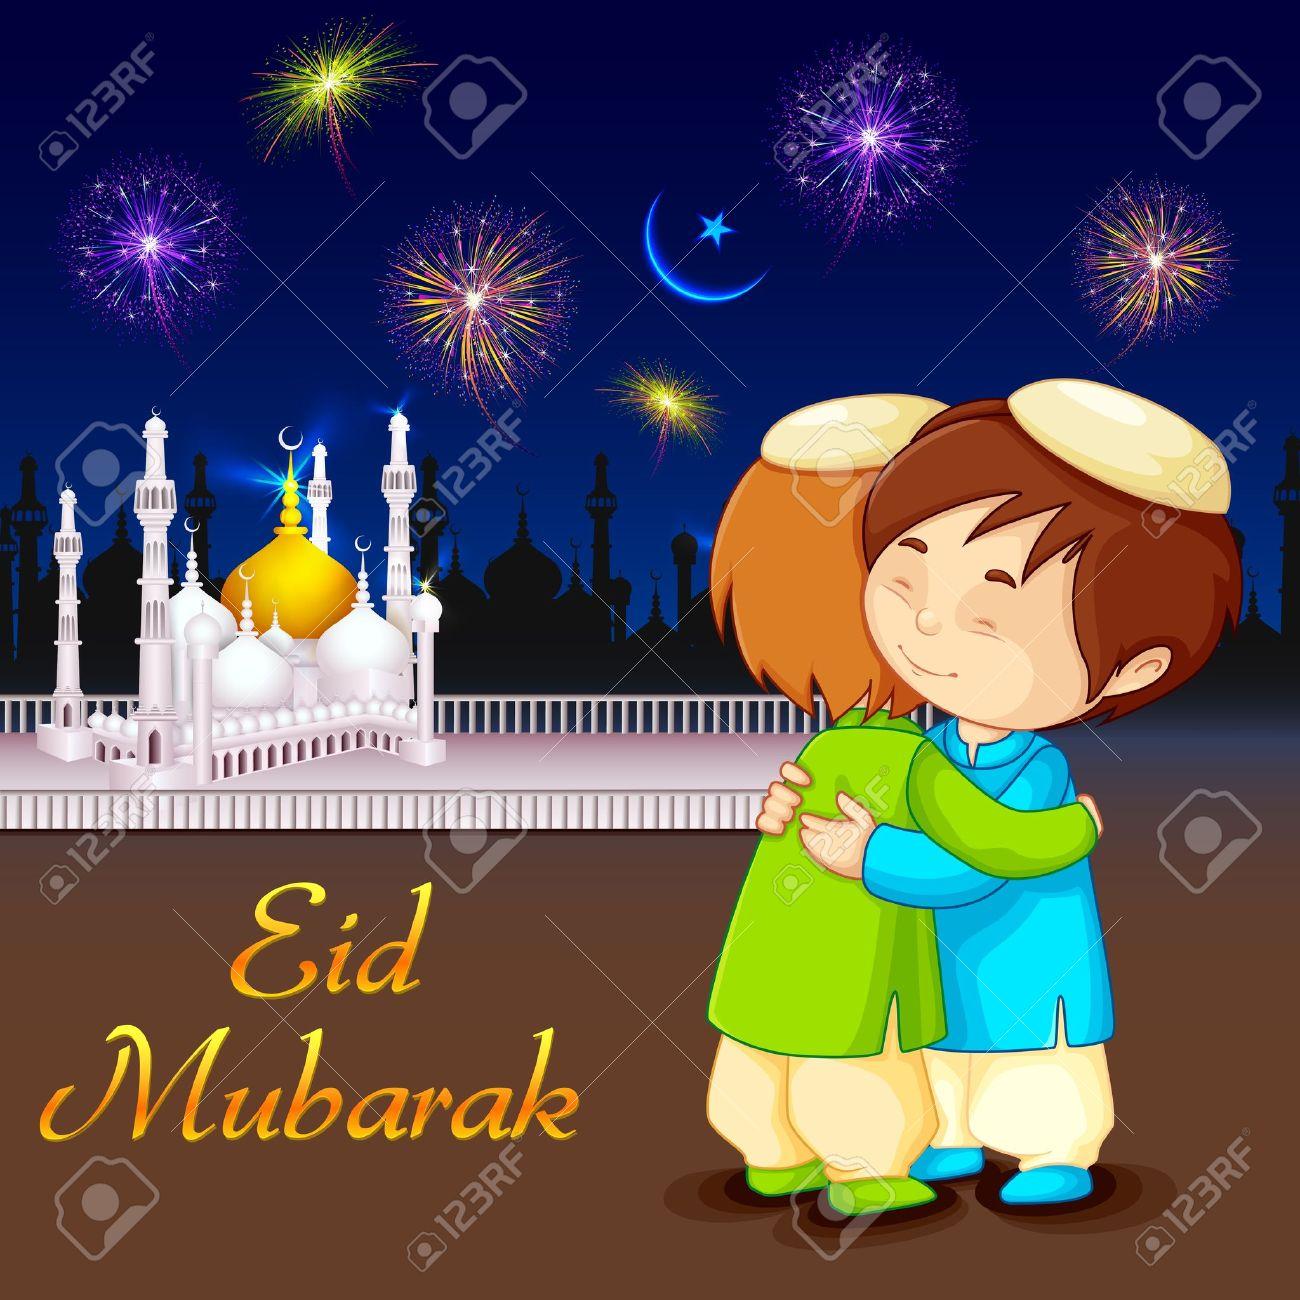 Vector Illustration Of People Hugging And Wishing Eid Mubarak.